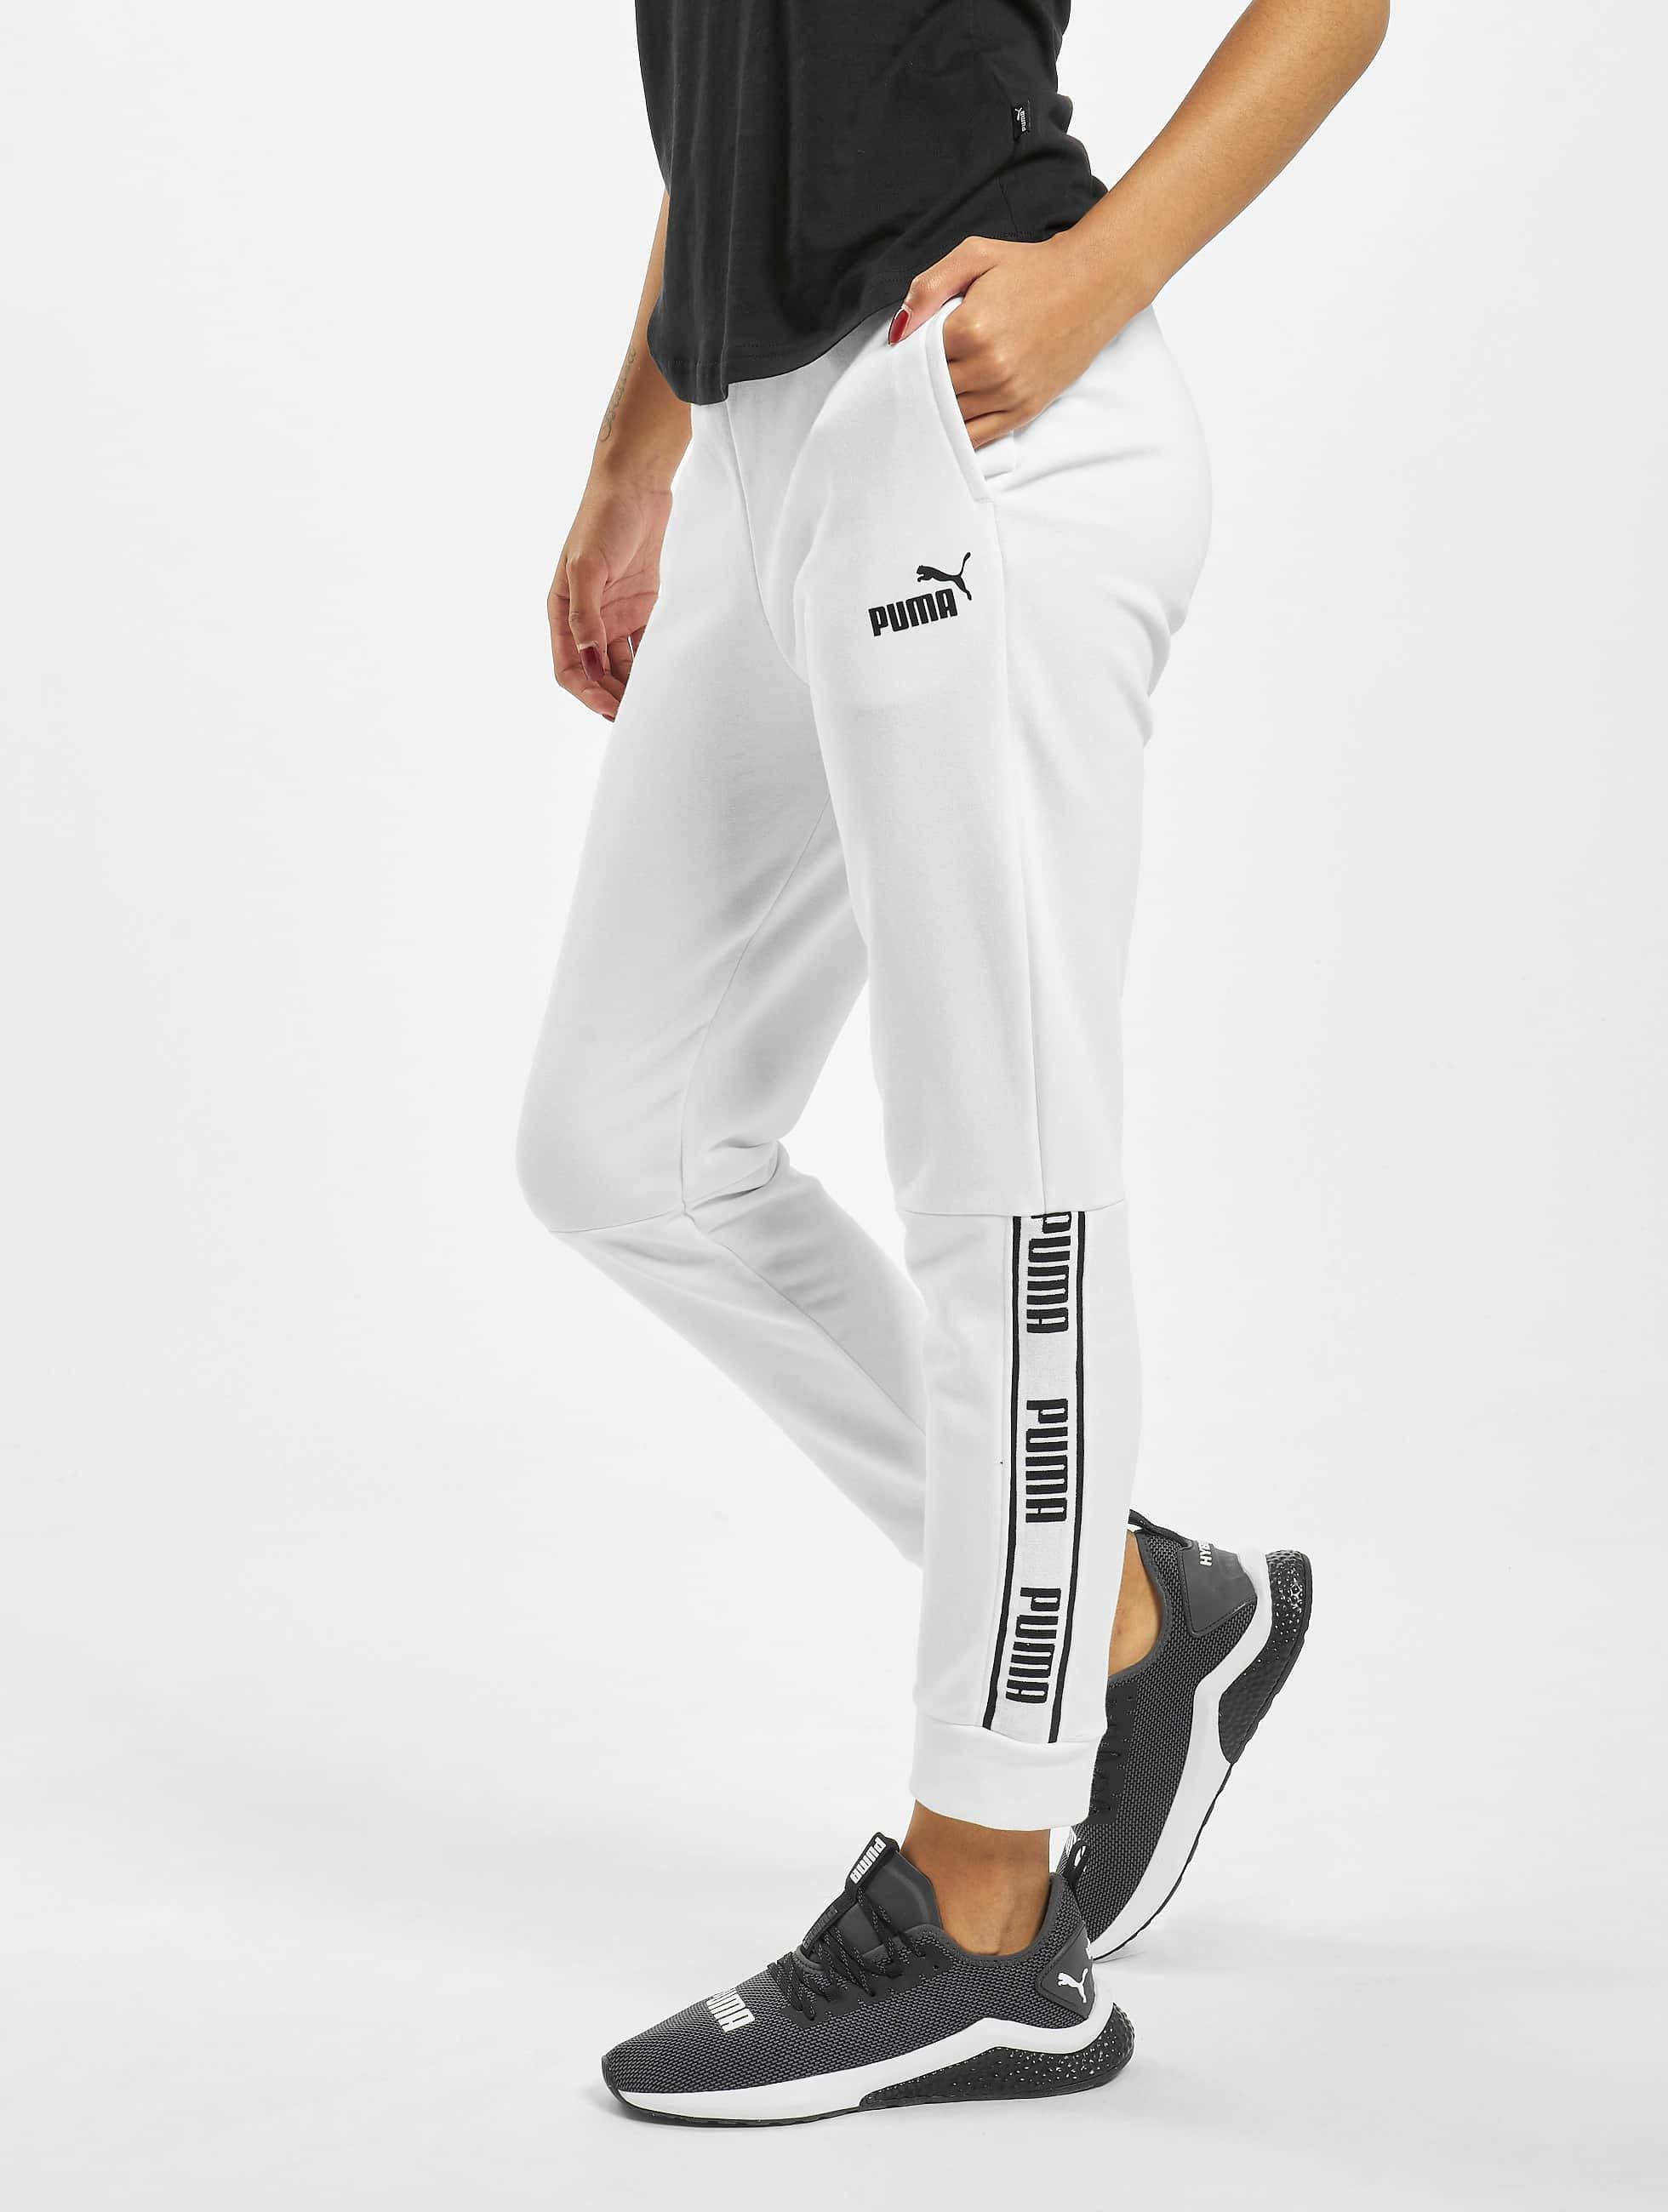 Puma Performance Amplified Track Jogger Pants Puma White